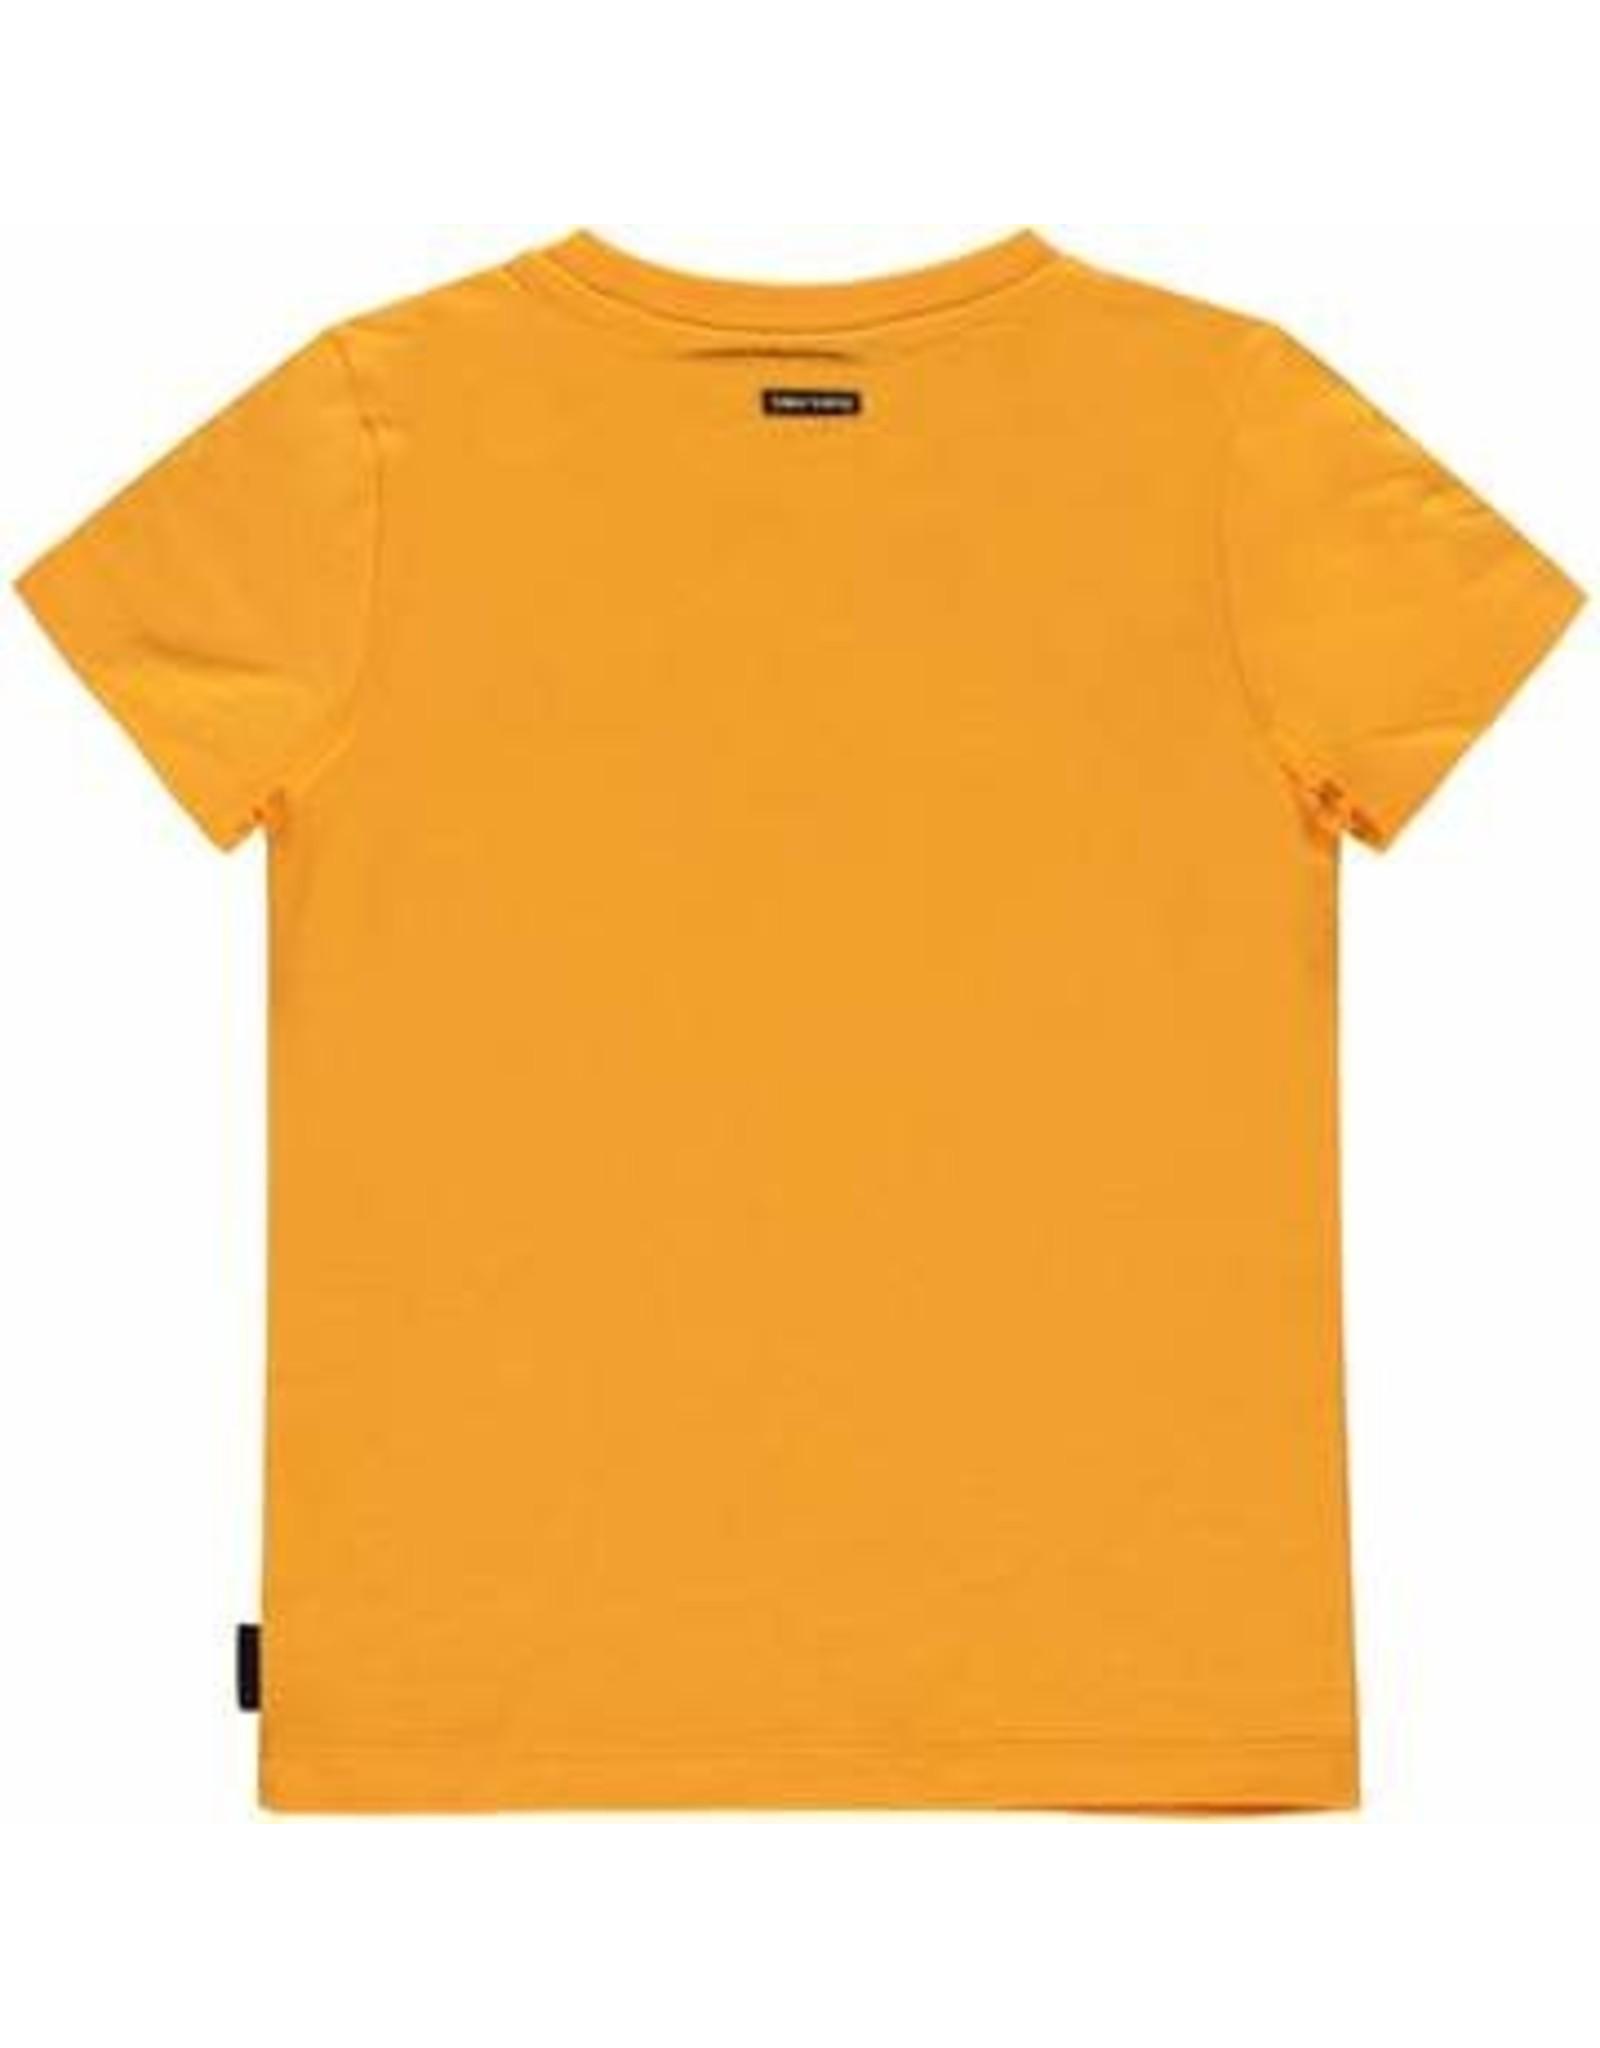 TUMBLE 'N DRY Tumble 'N Dry Boys Hi - Gus Orange Cadmium Yellow